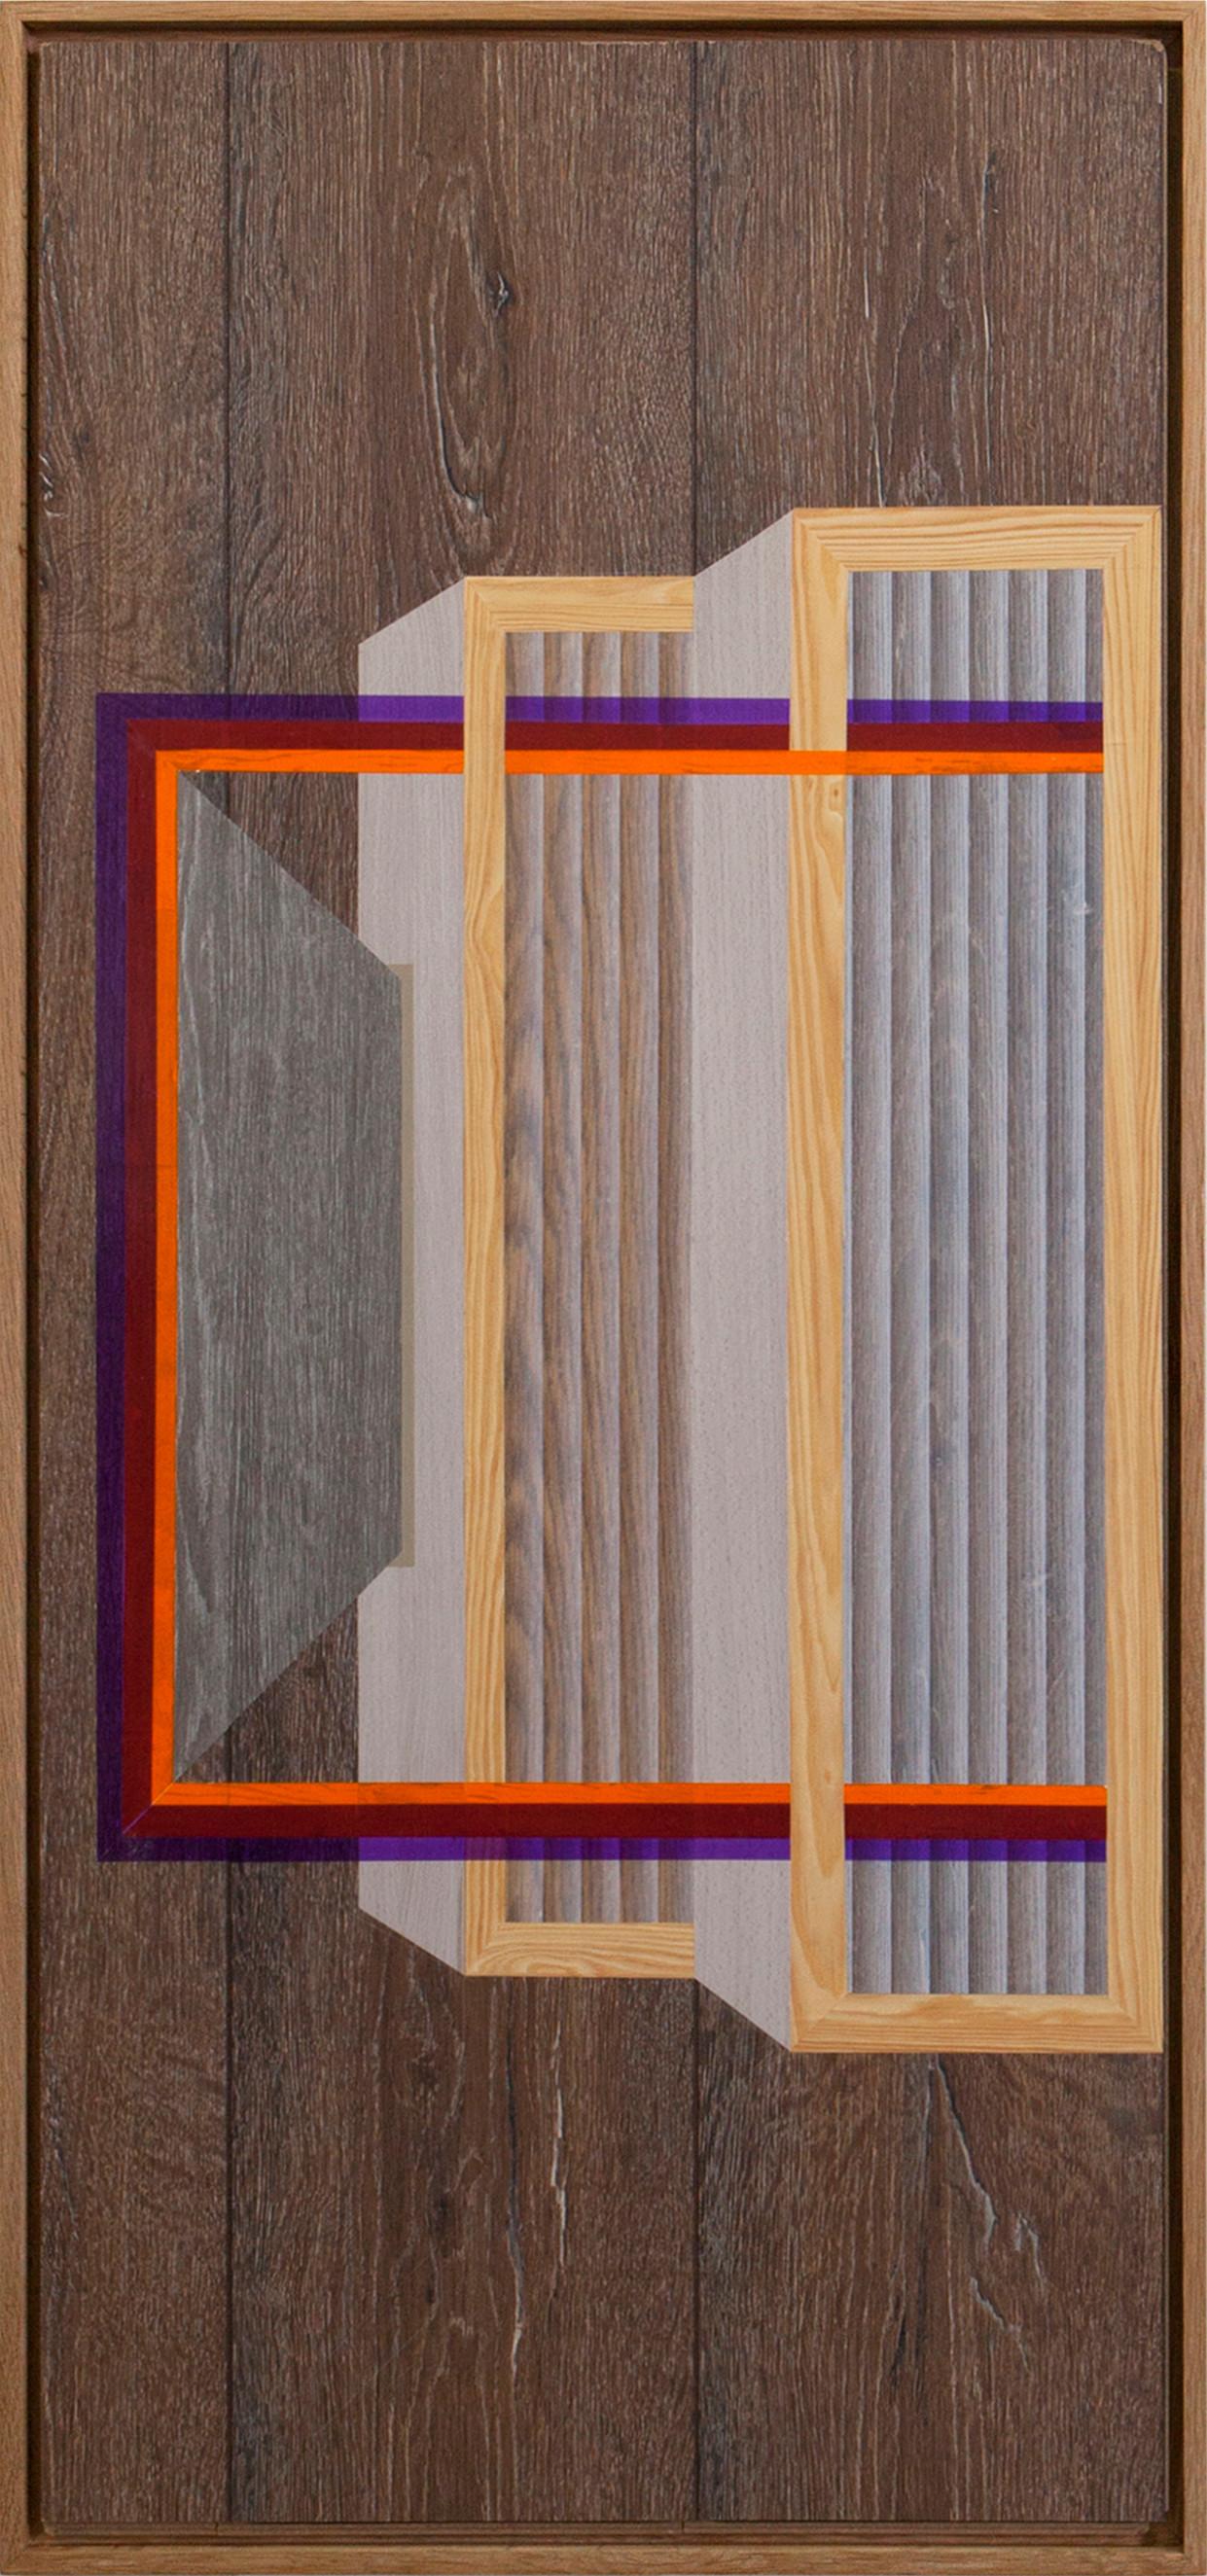 """Level #1"" 40/120 cm wallpaper and tape on floor panels"